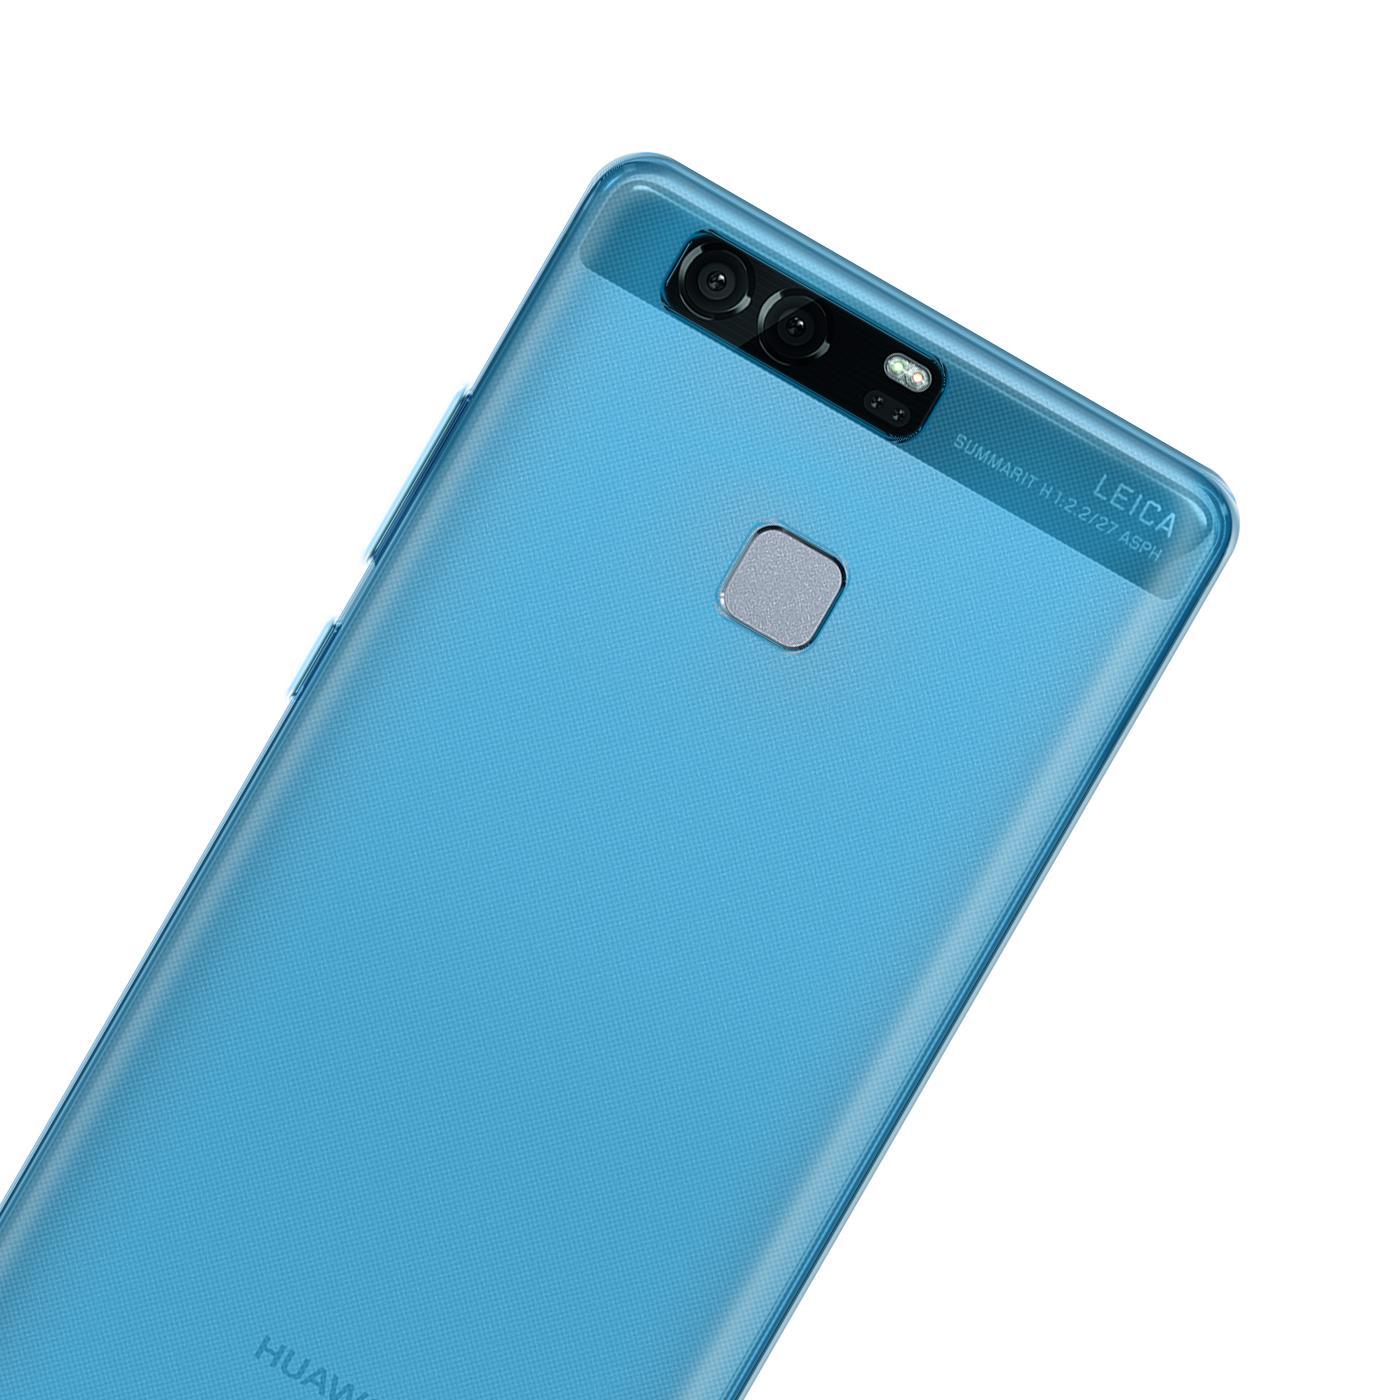 Huawei-p9-Duenn-Silikon-Klar-Case-Cover-Ultra-Slim-Stossfeste-Gel-Rueckseite Indexbild 10